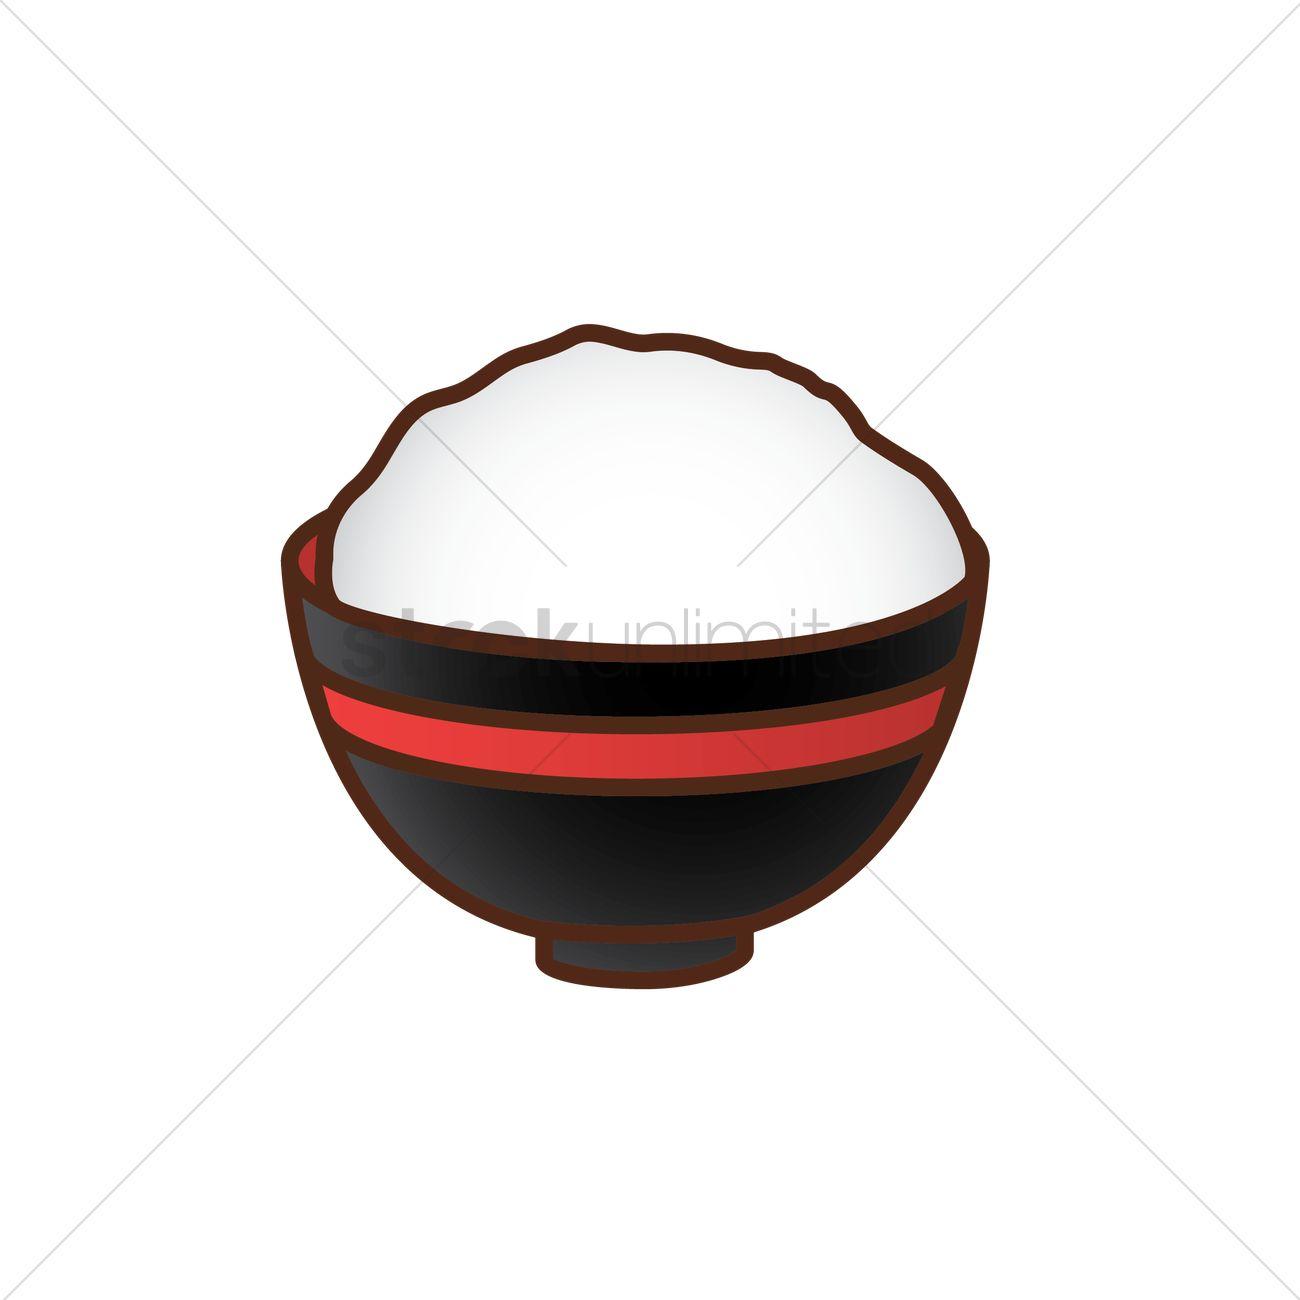 1300x1300 Rice Bowl Vector Image